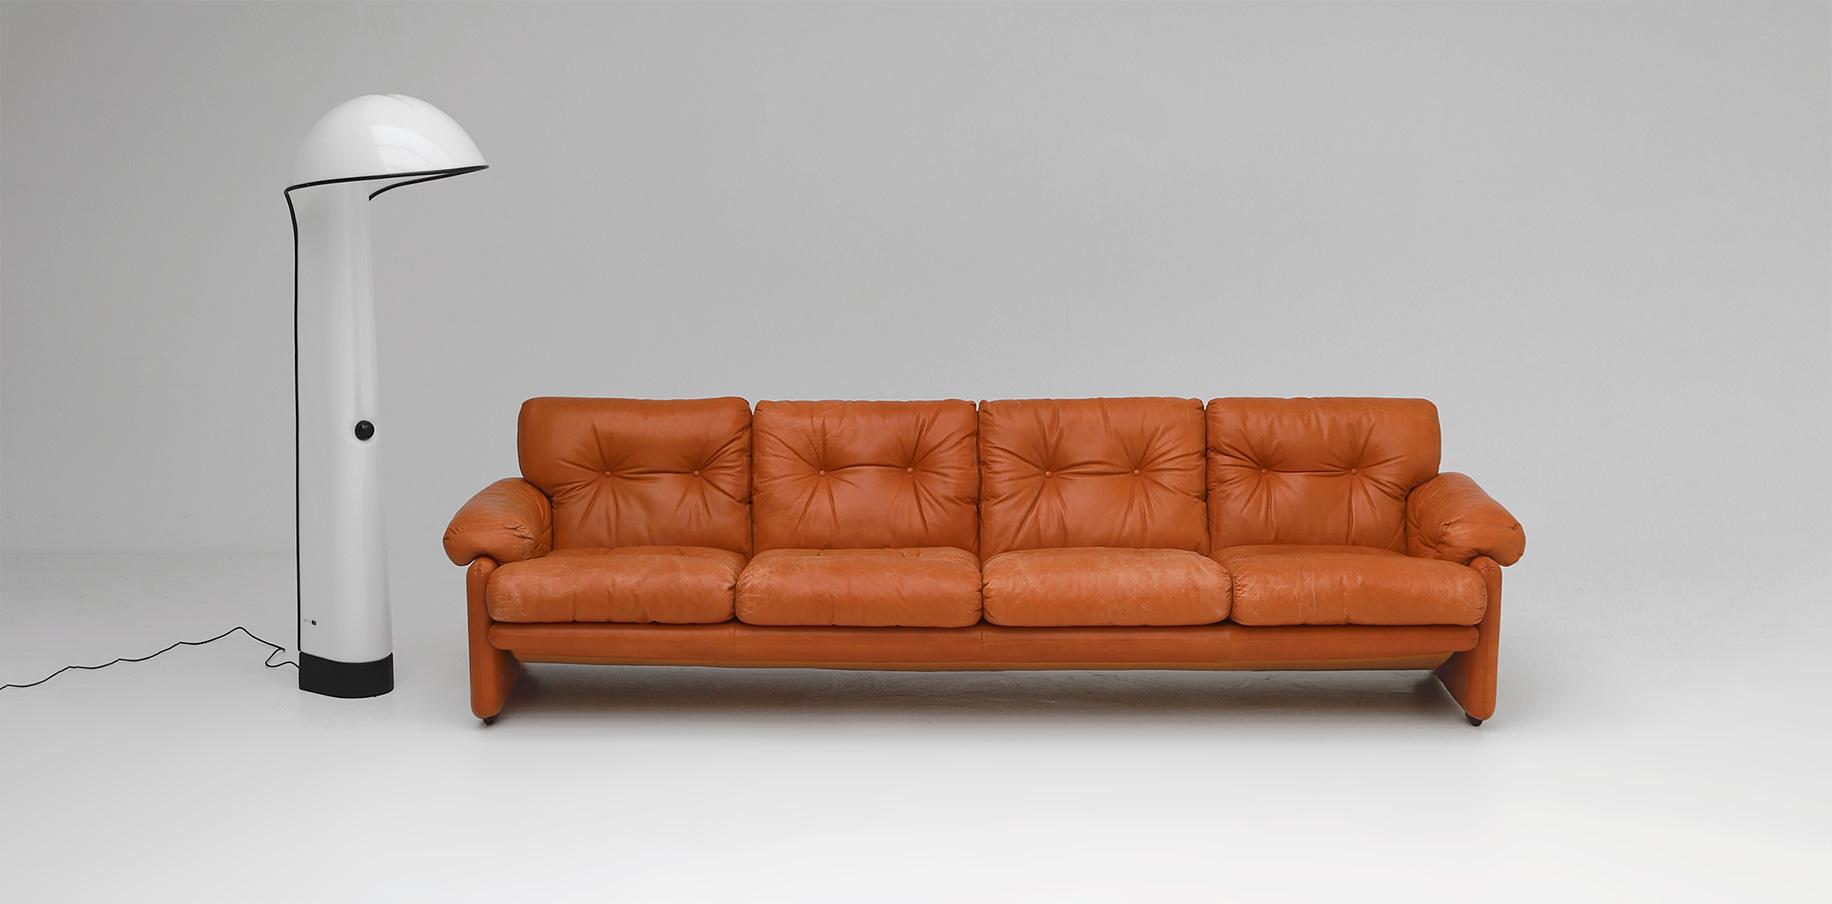 City furniture highlight 1